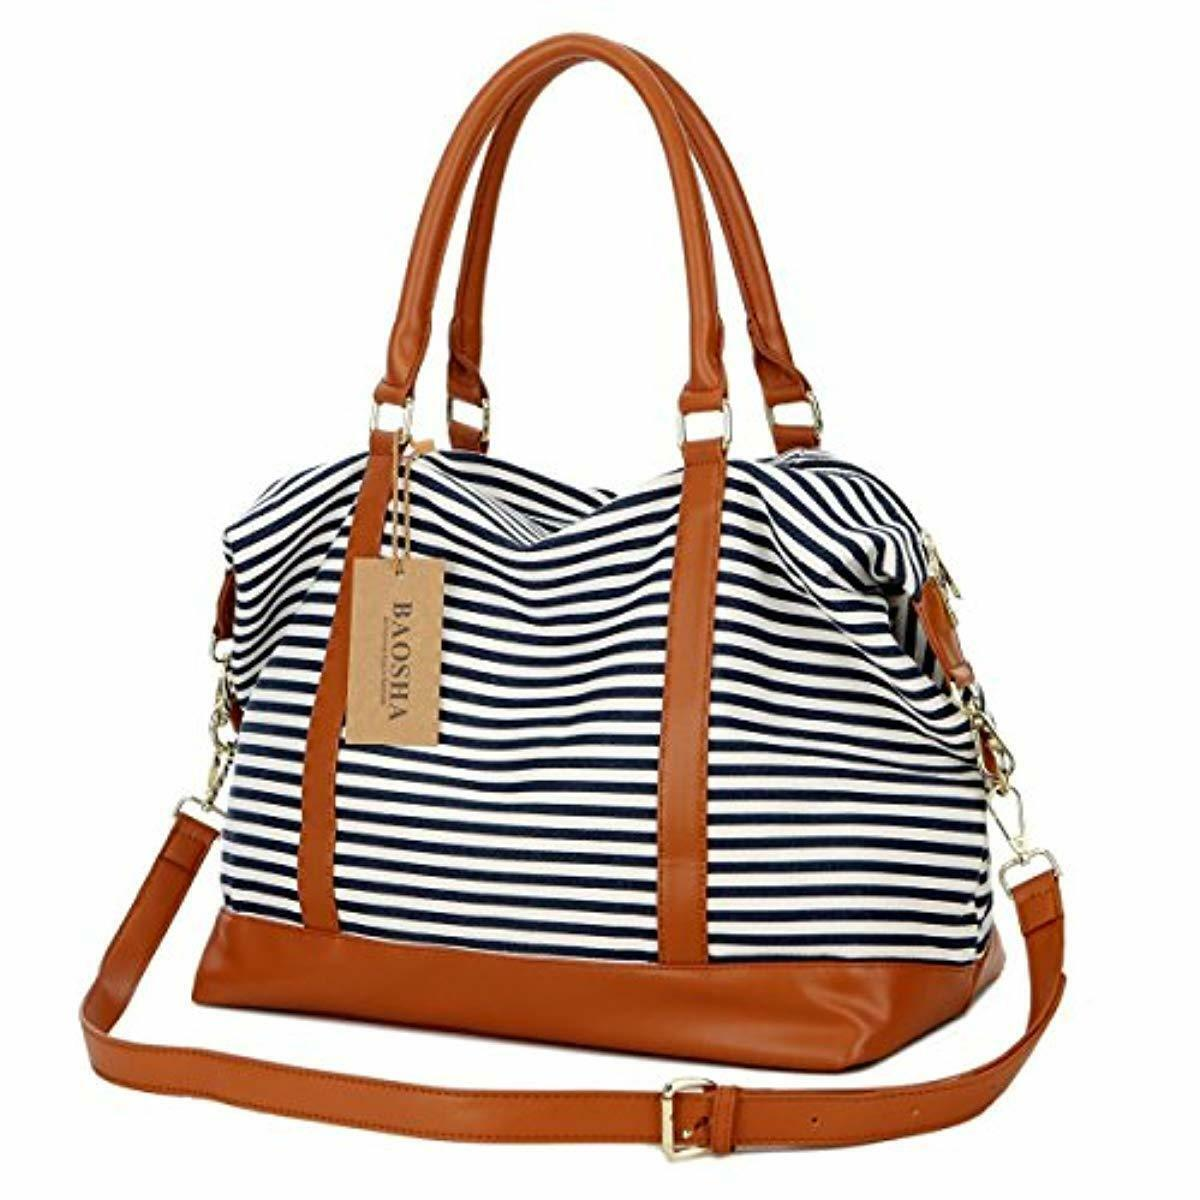 Women Canvas Travel Weekender Bag Overnight Carry-on Duffel